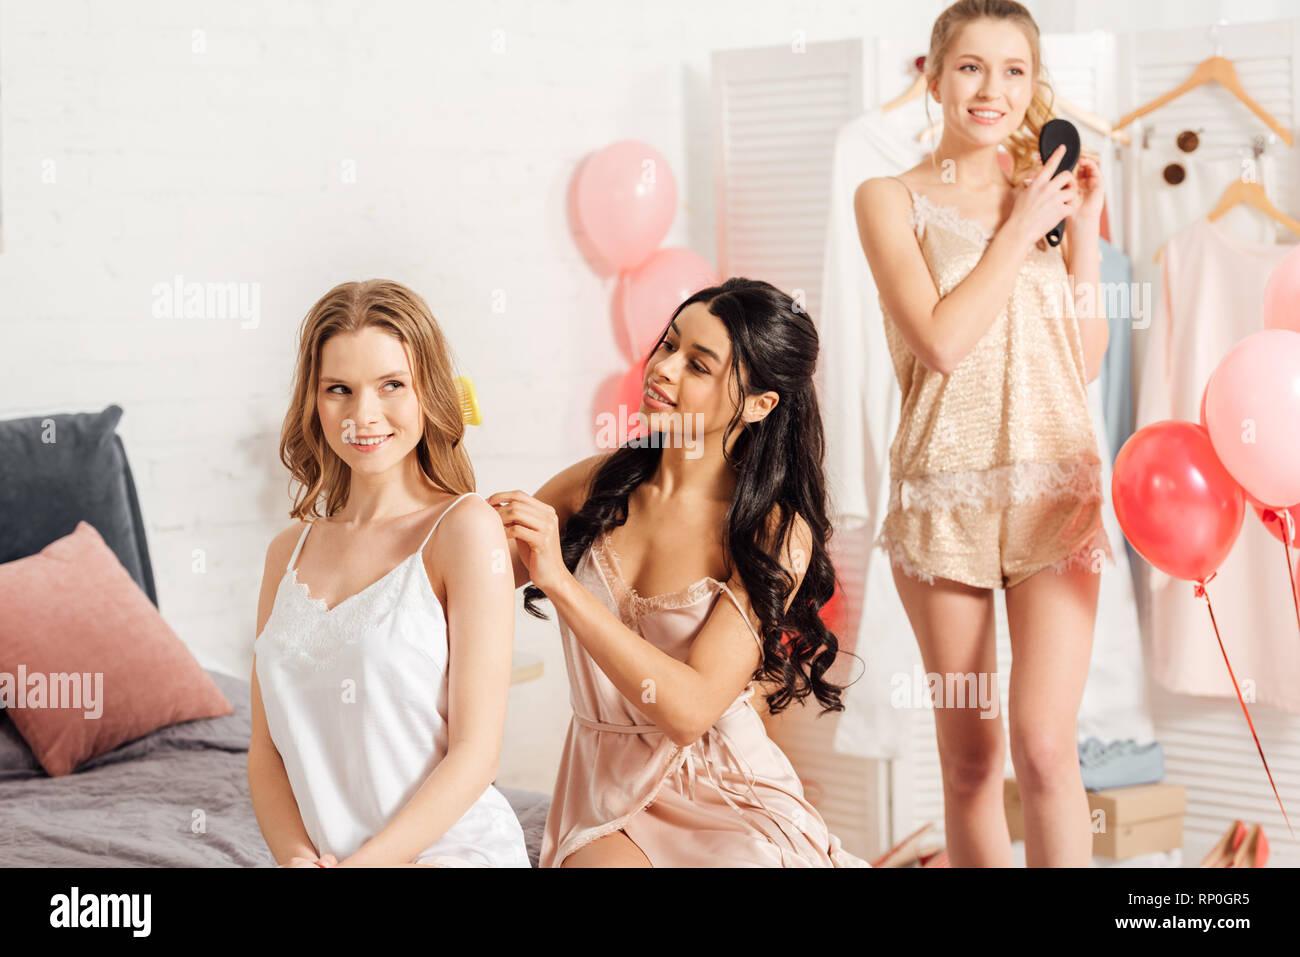 beautiful smiling multicultural girls in nightwear brushing hair during pajama party - Stock Image